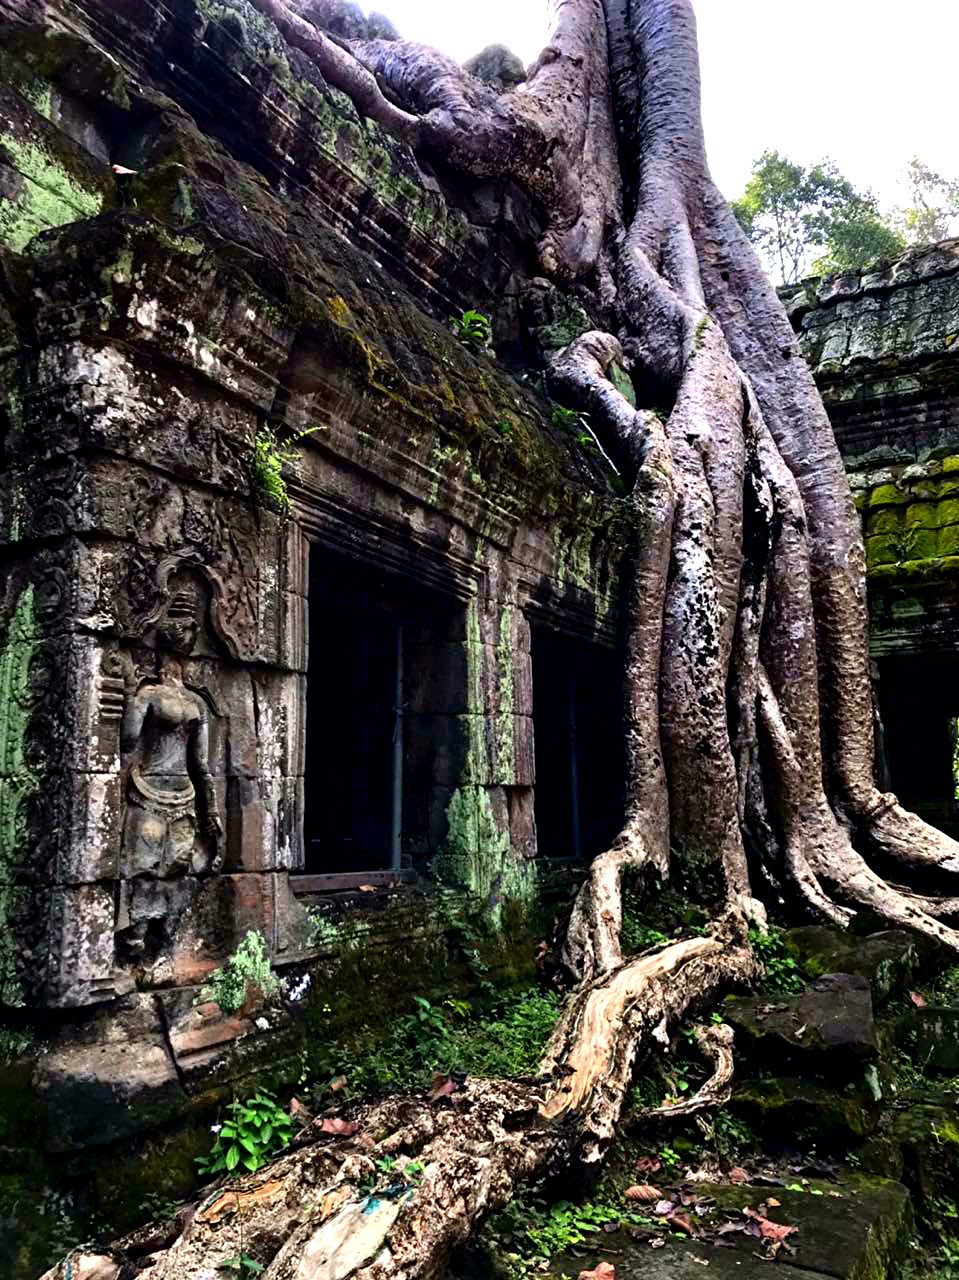 Елена Руденко (Валтея). Камбоджа. Ангкор. Fm7LPmBzVq0